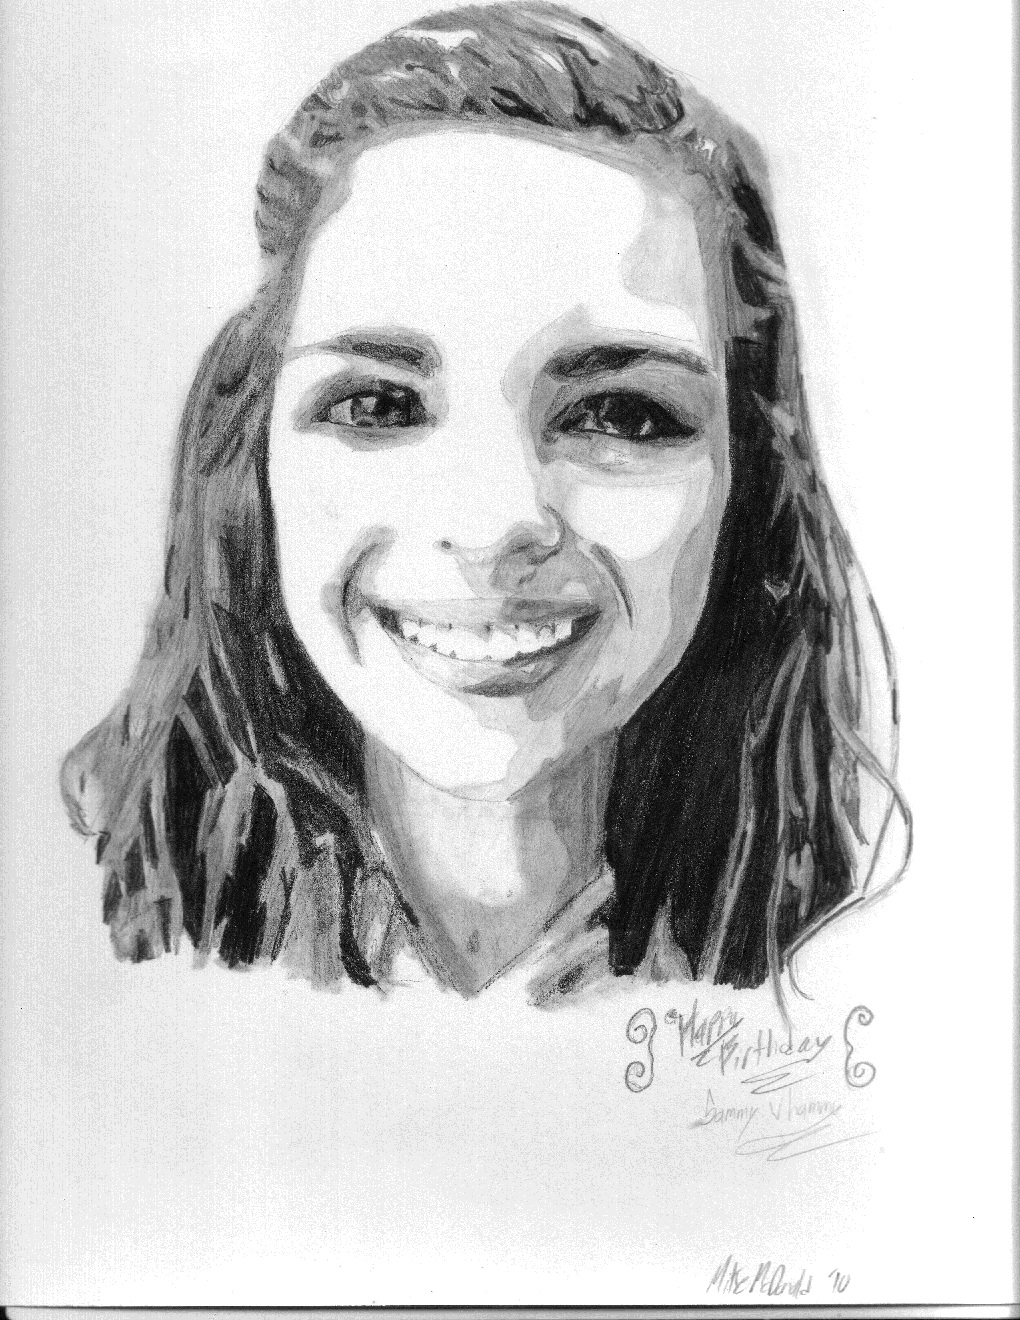 Sammy Portrait (For her b-day)